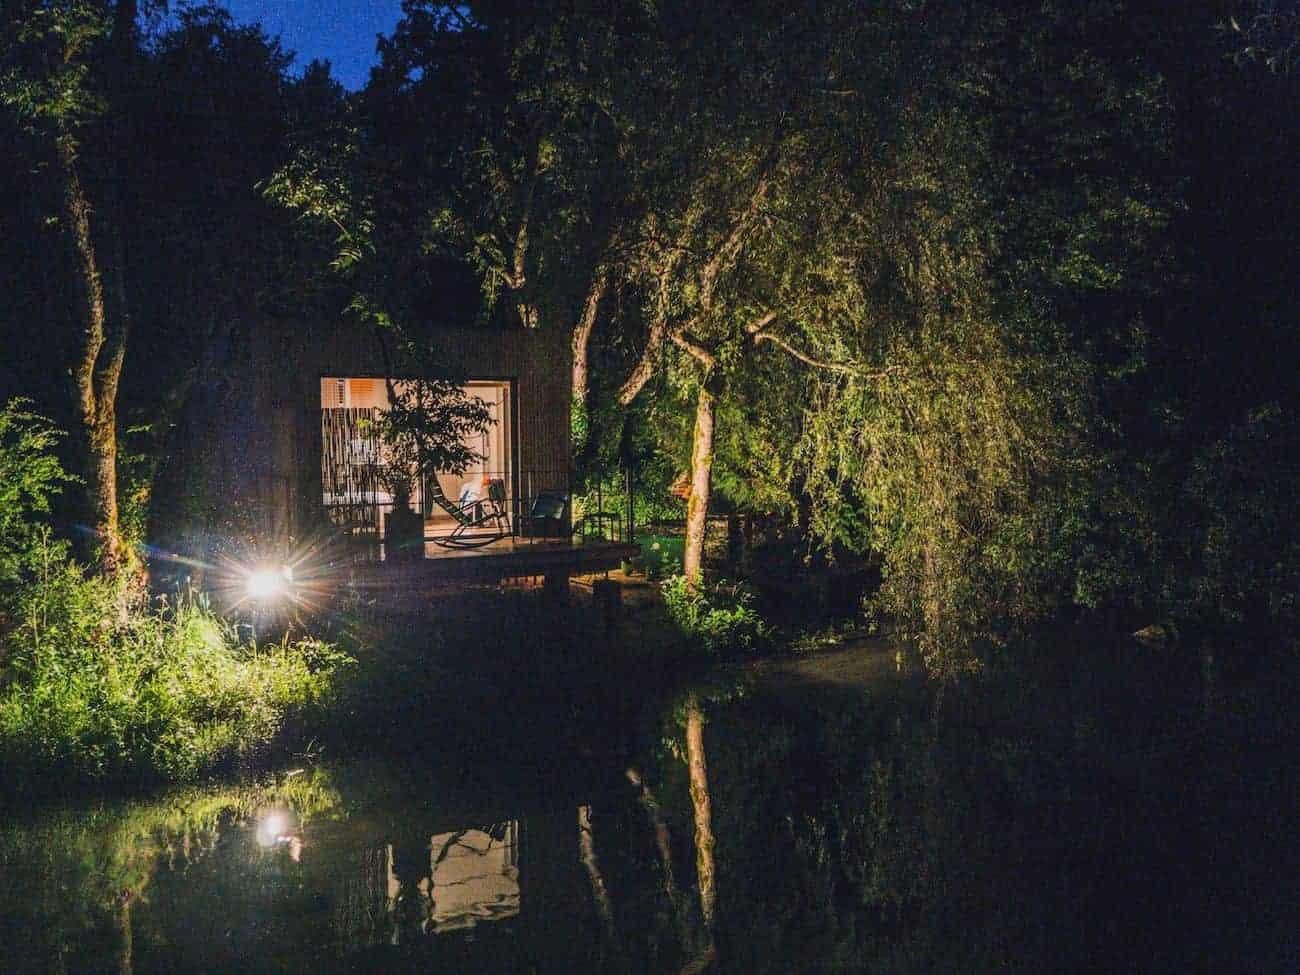 Visiter-Dijon-ou-dormir-pont-roche-et-spa-5